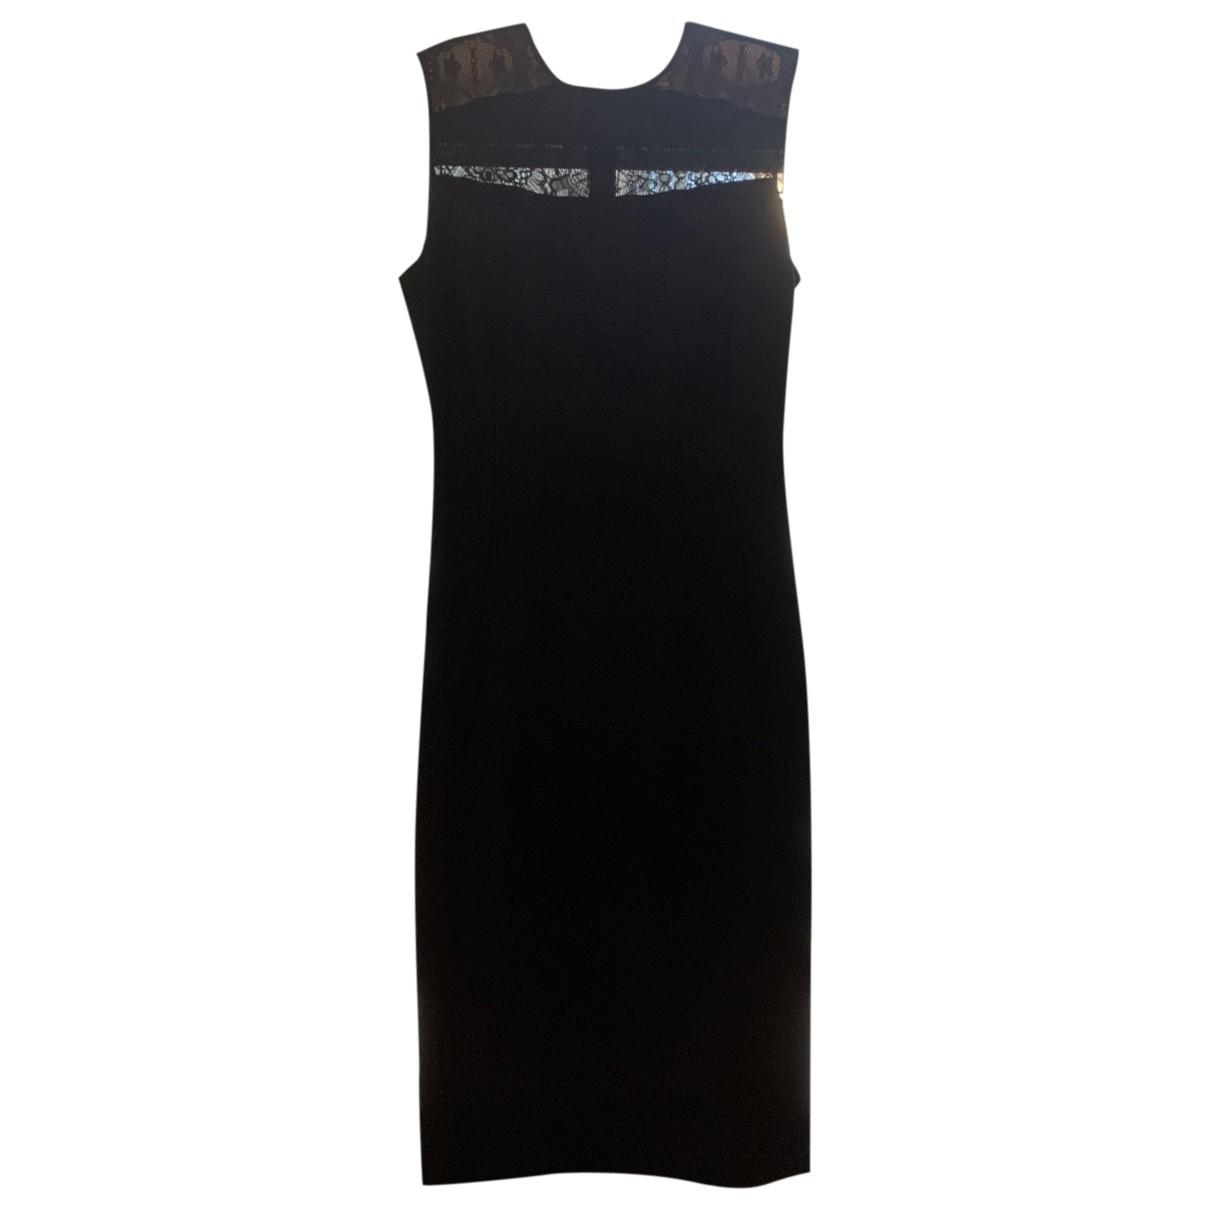 Stella Mccartney \N Kleid in  Schwarz Baumwolle - Elasthan